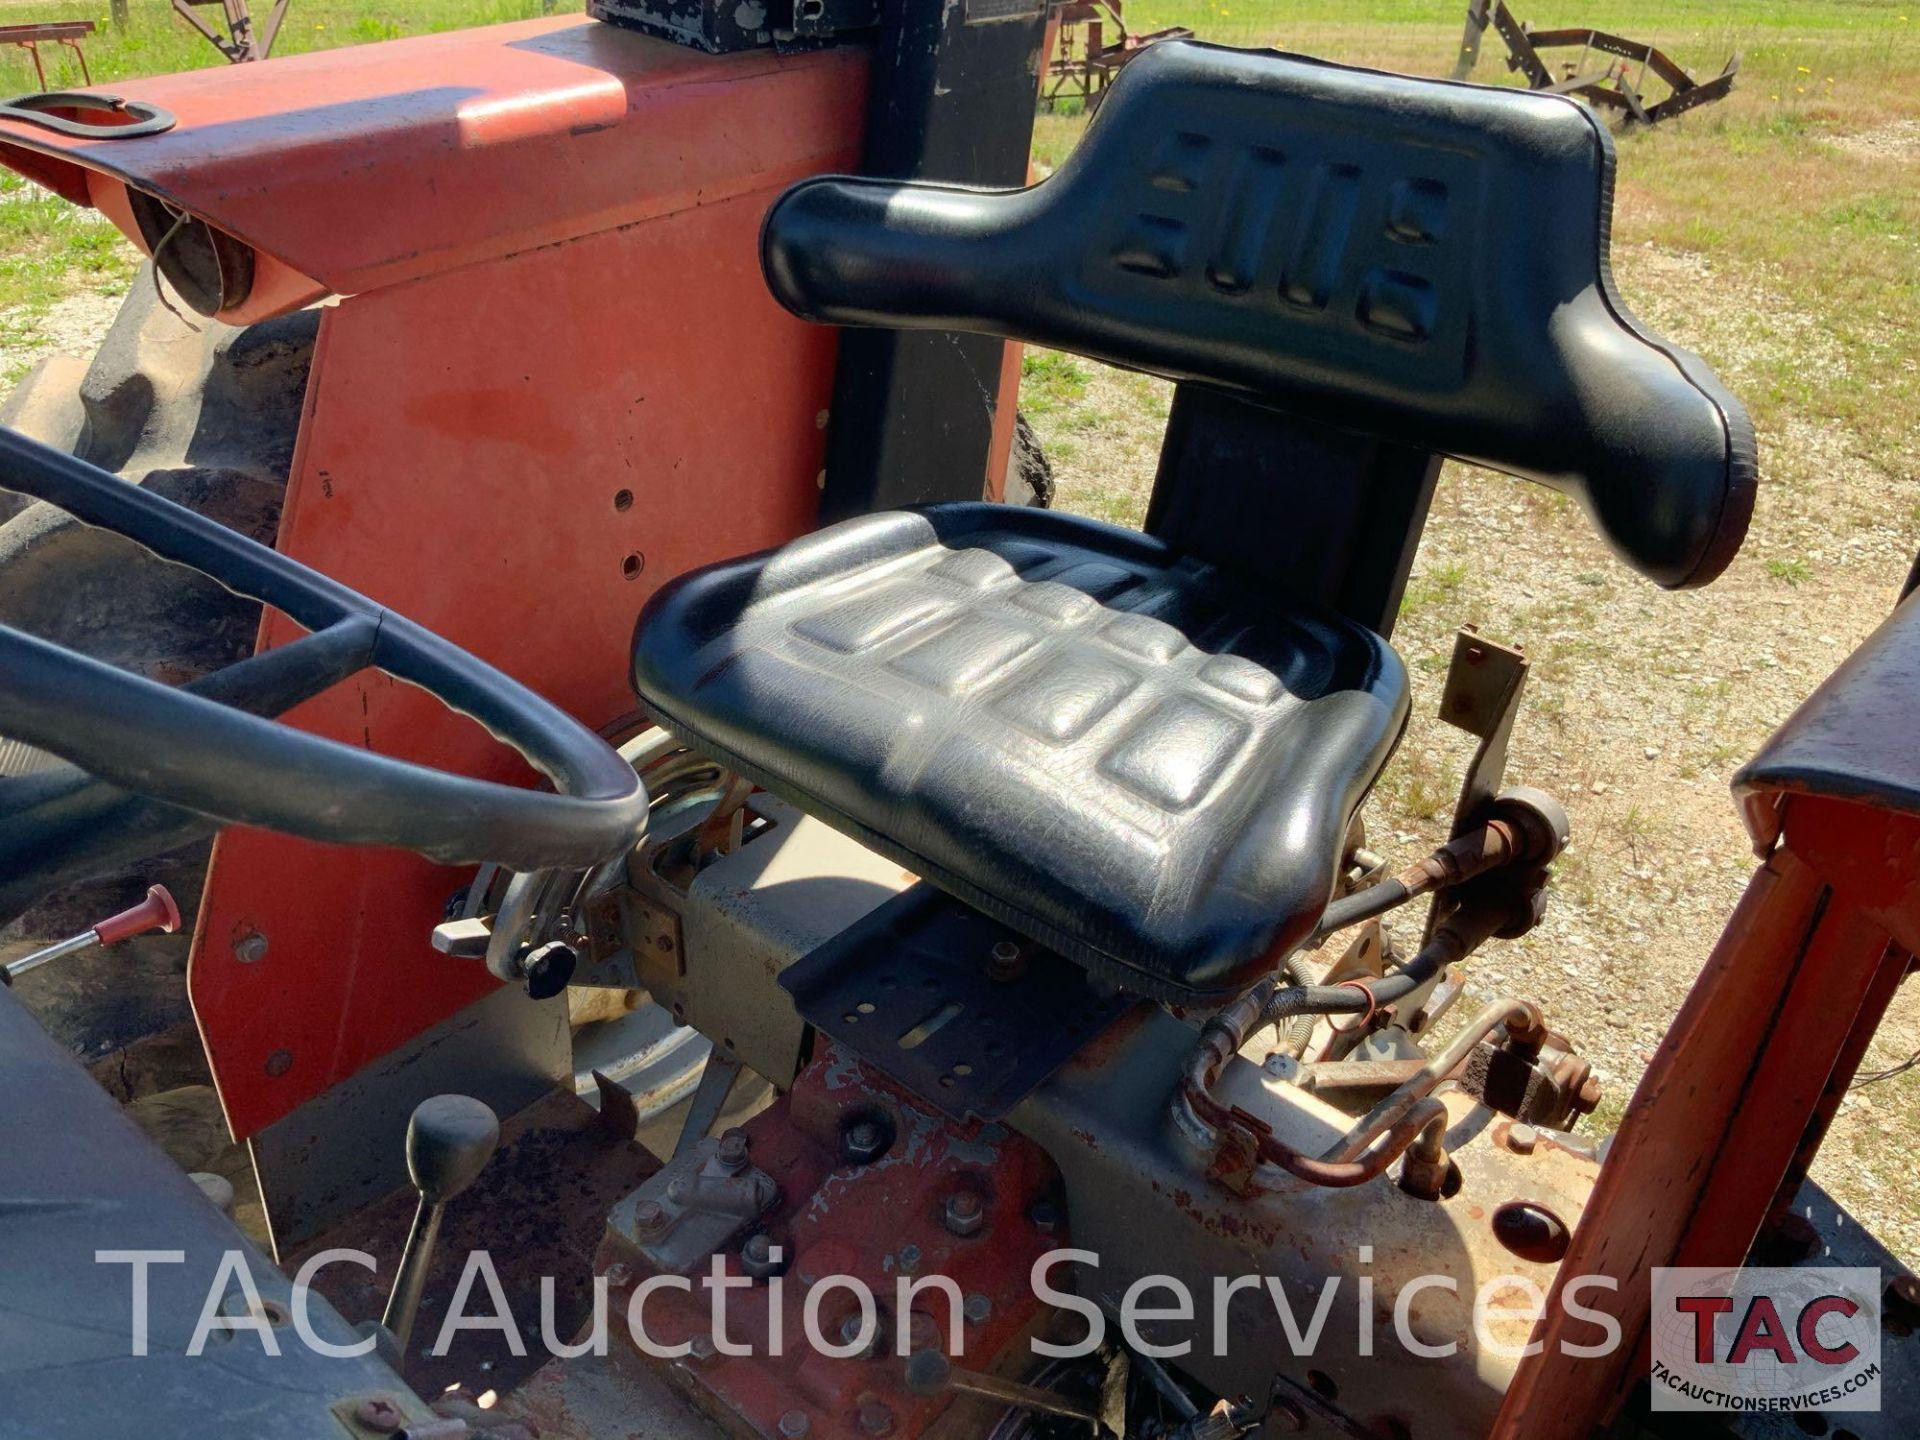 Massey Ferguson 265 FarmTractor - Image 18 of 23